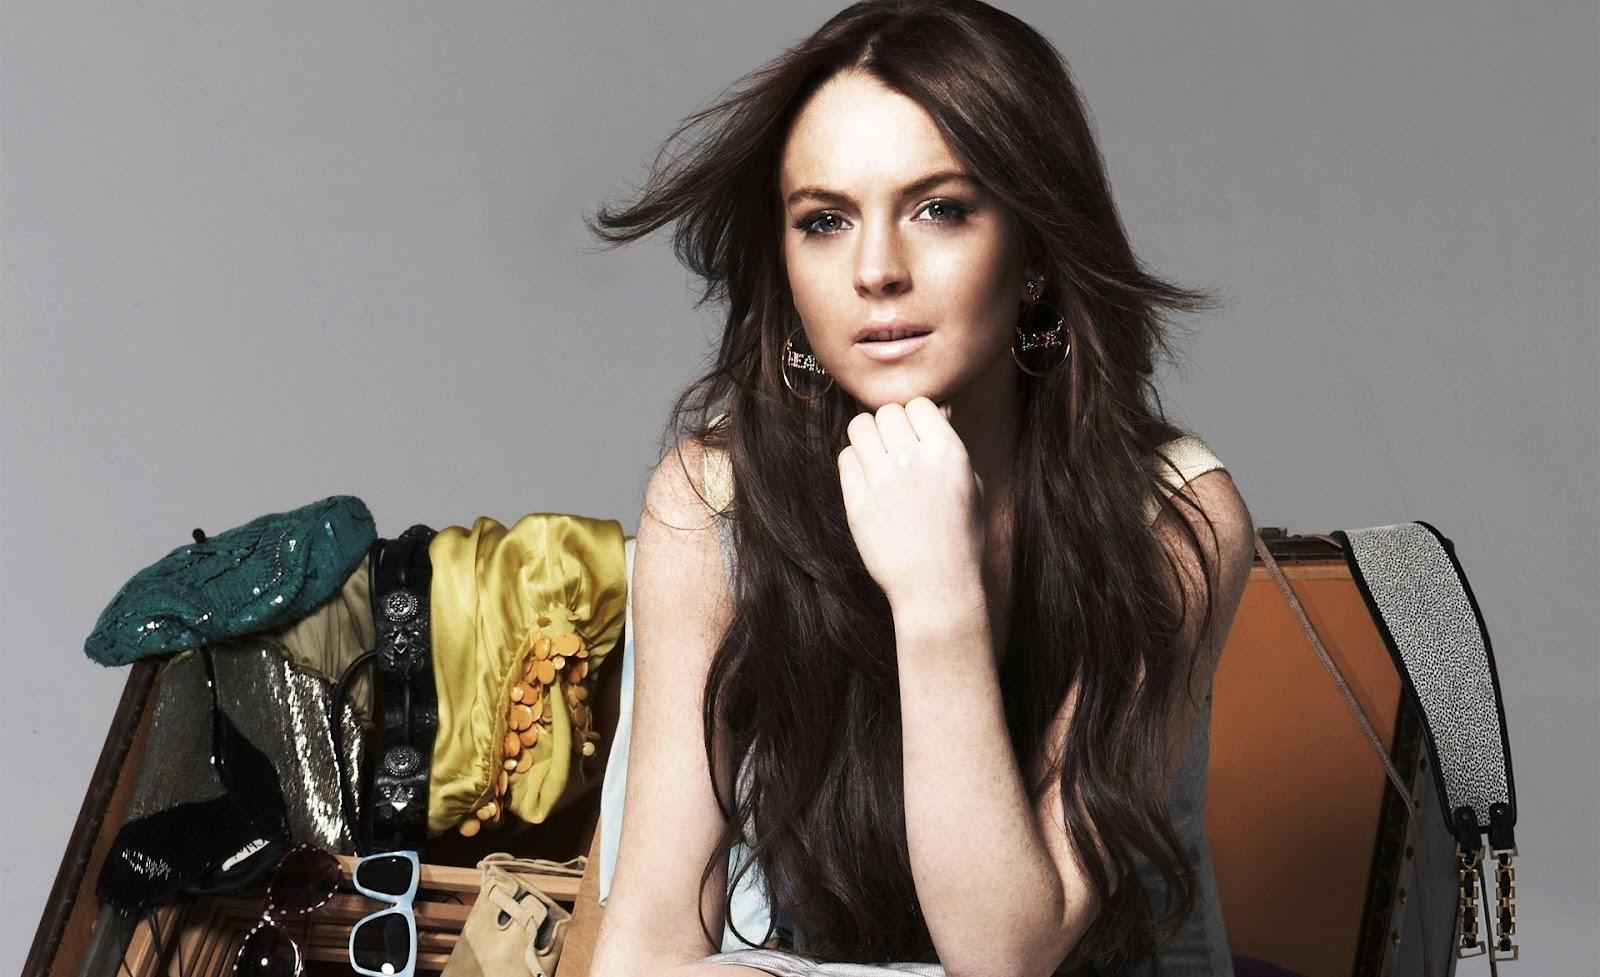 Lindsay Lohan with her boyfriend